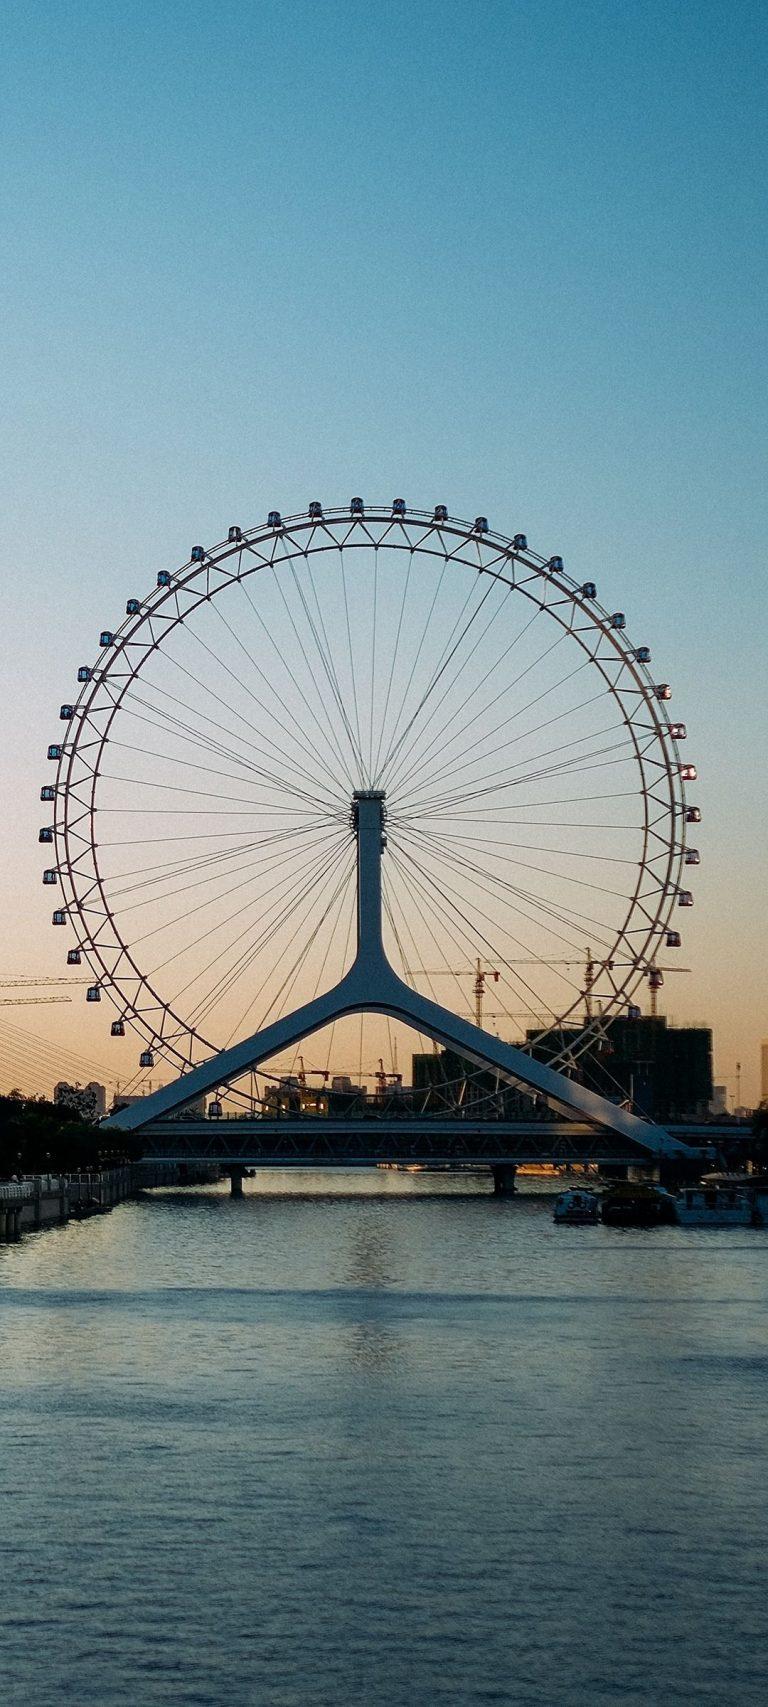 Ferris Wheel City Entertainment 1080x2400 768x1707